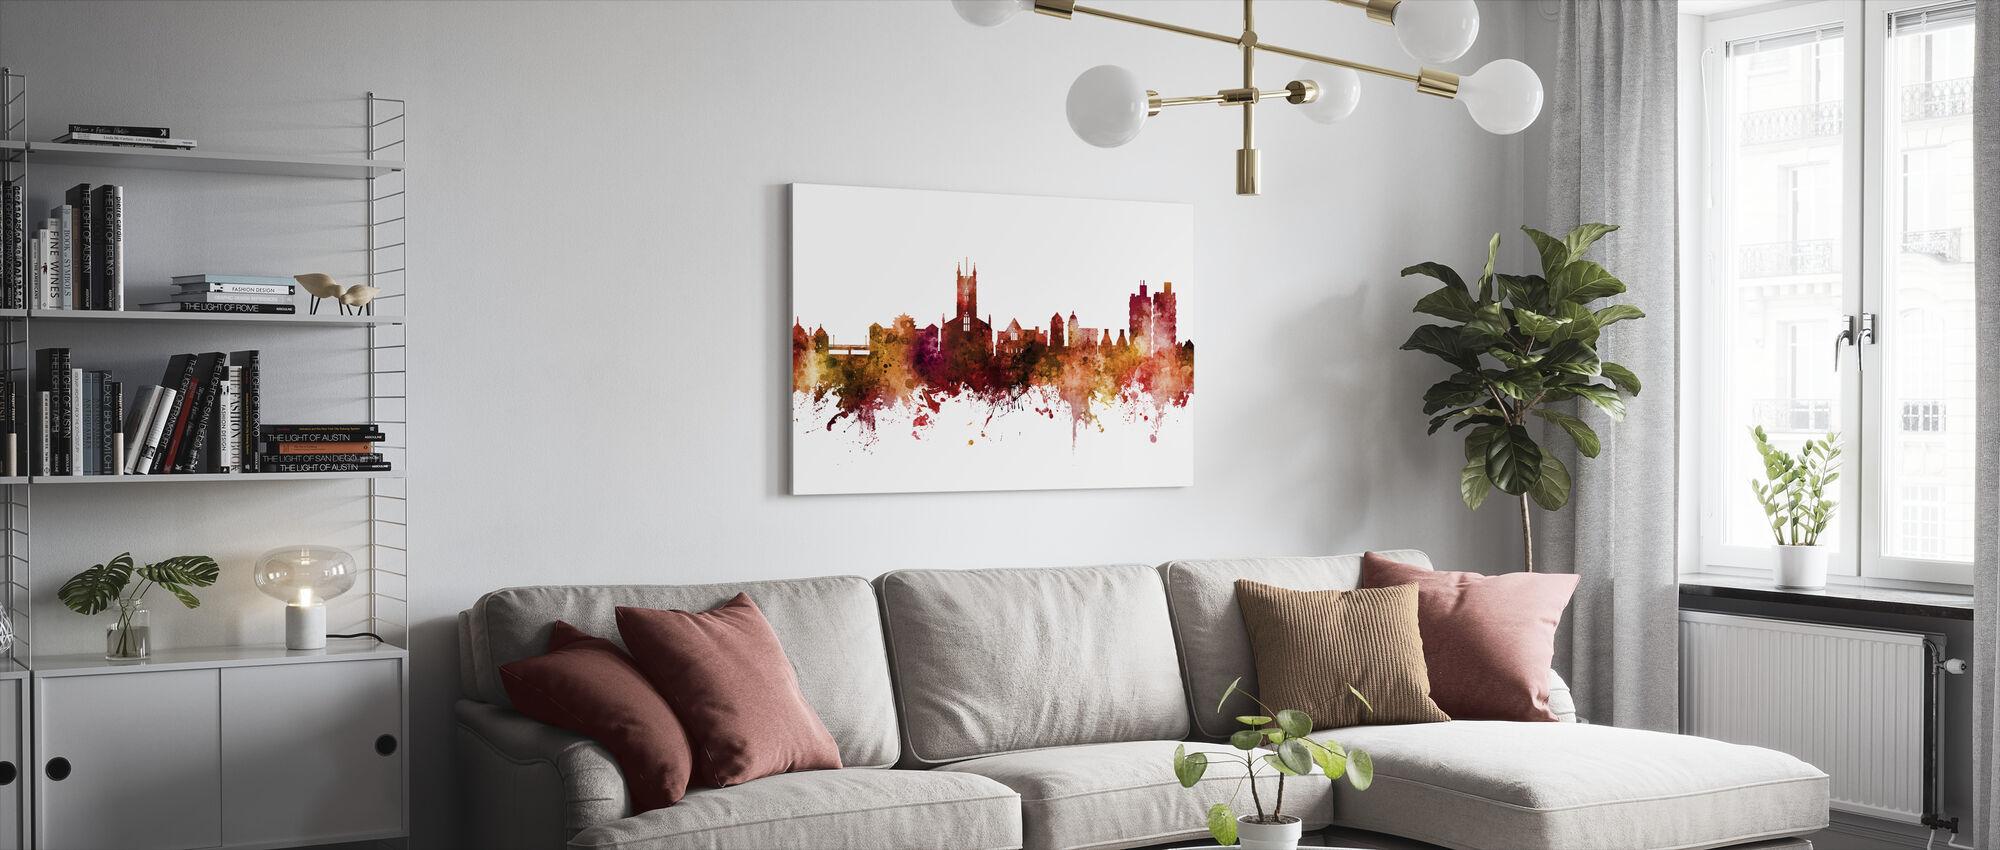 Stoke-on-Trent England Skyline - Impression sur toile - Salle à manger